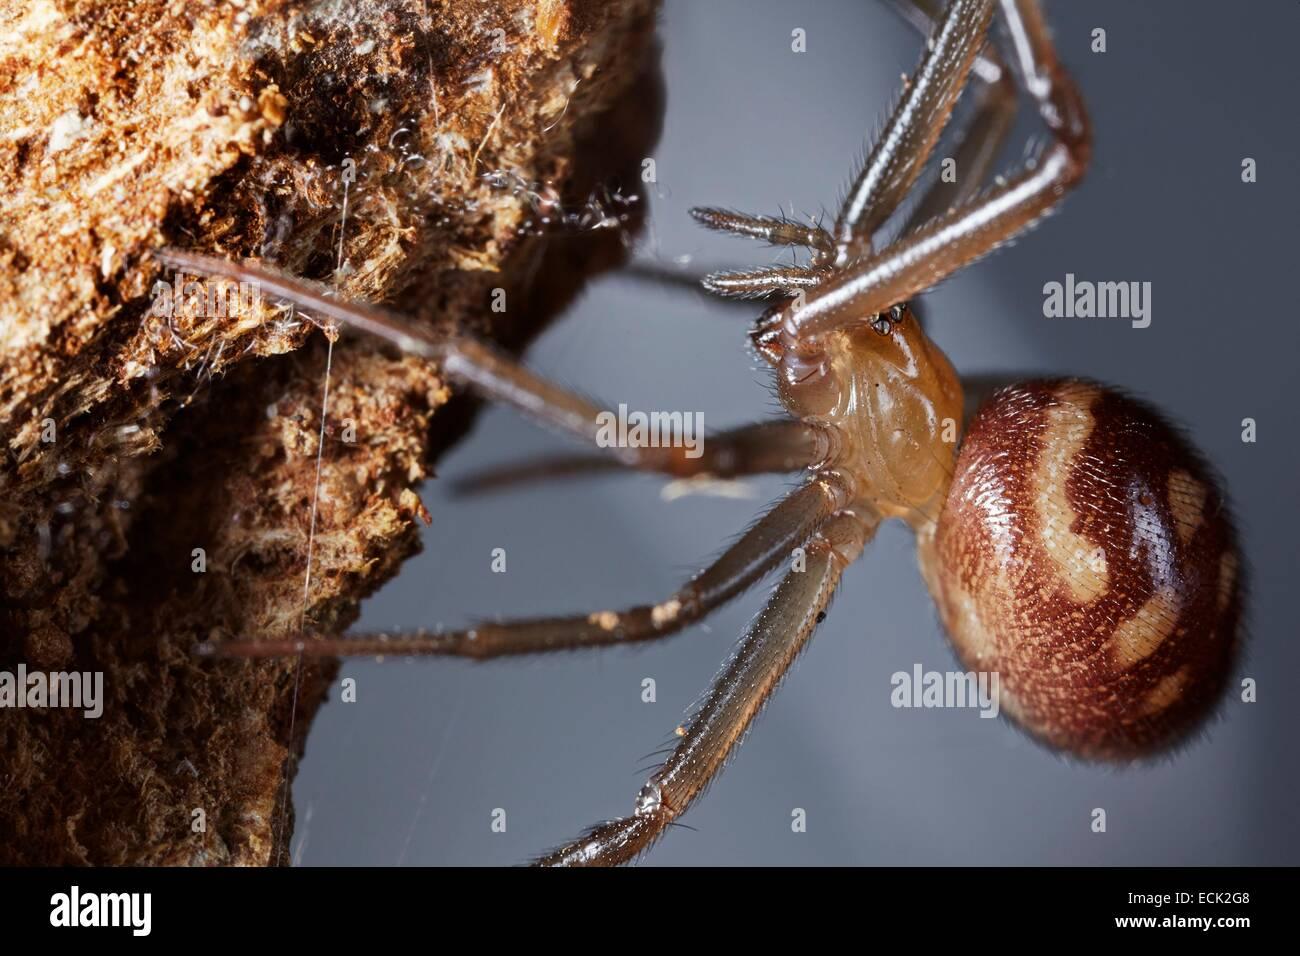 France, Paris, Araneae, Theridiidae, False black widow or Cupboard spider (Steatoda grossa), female - Stock Image